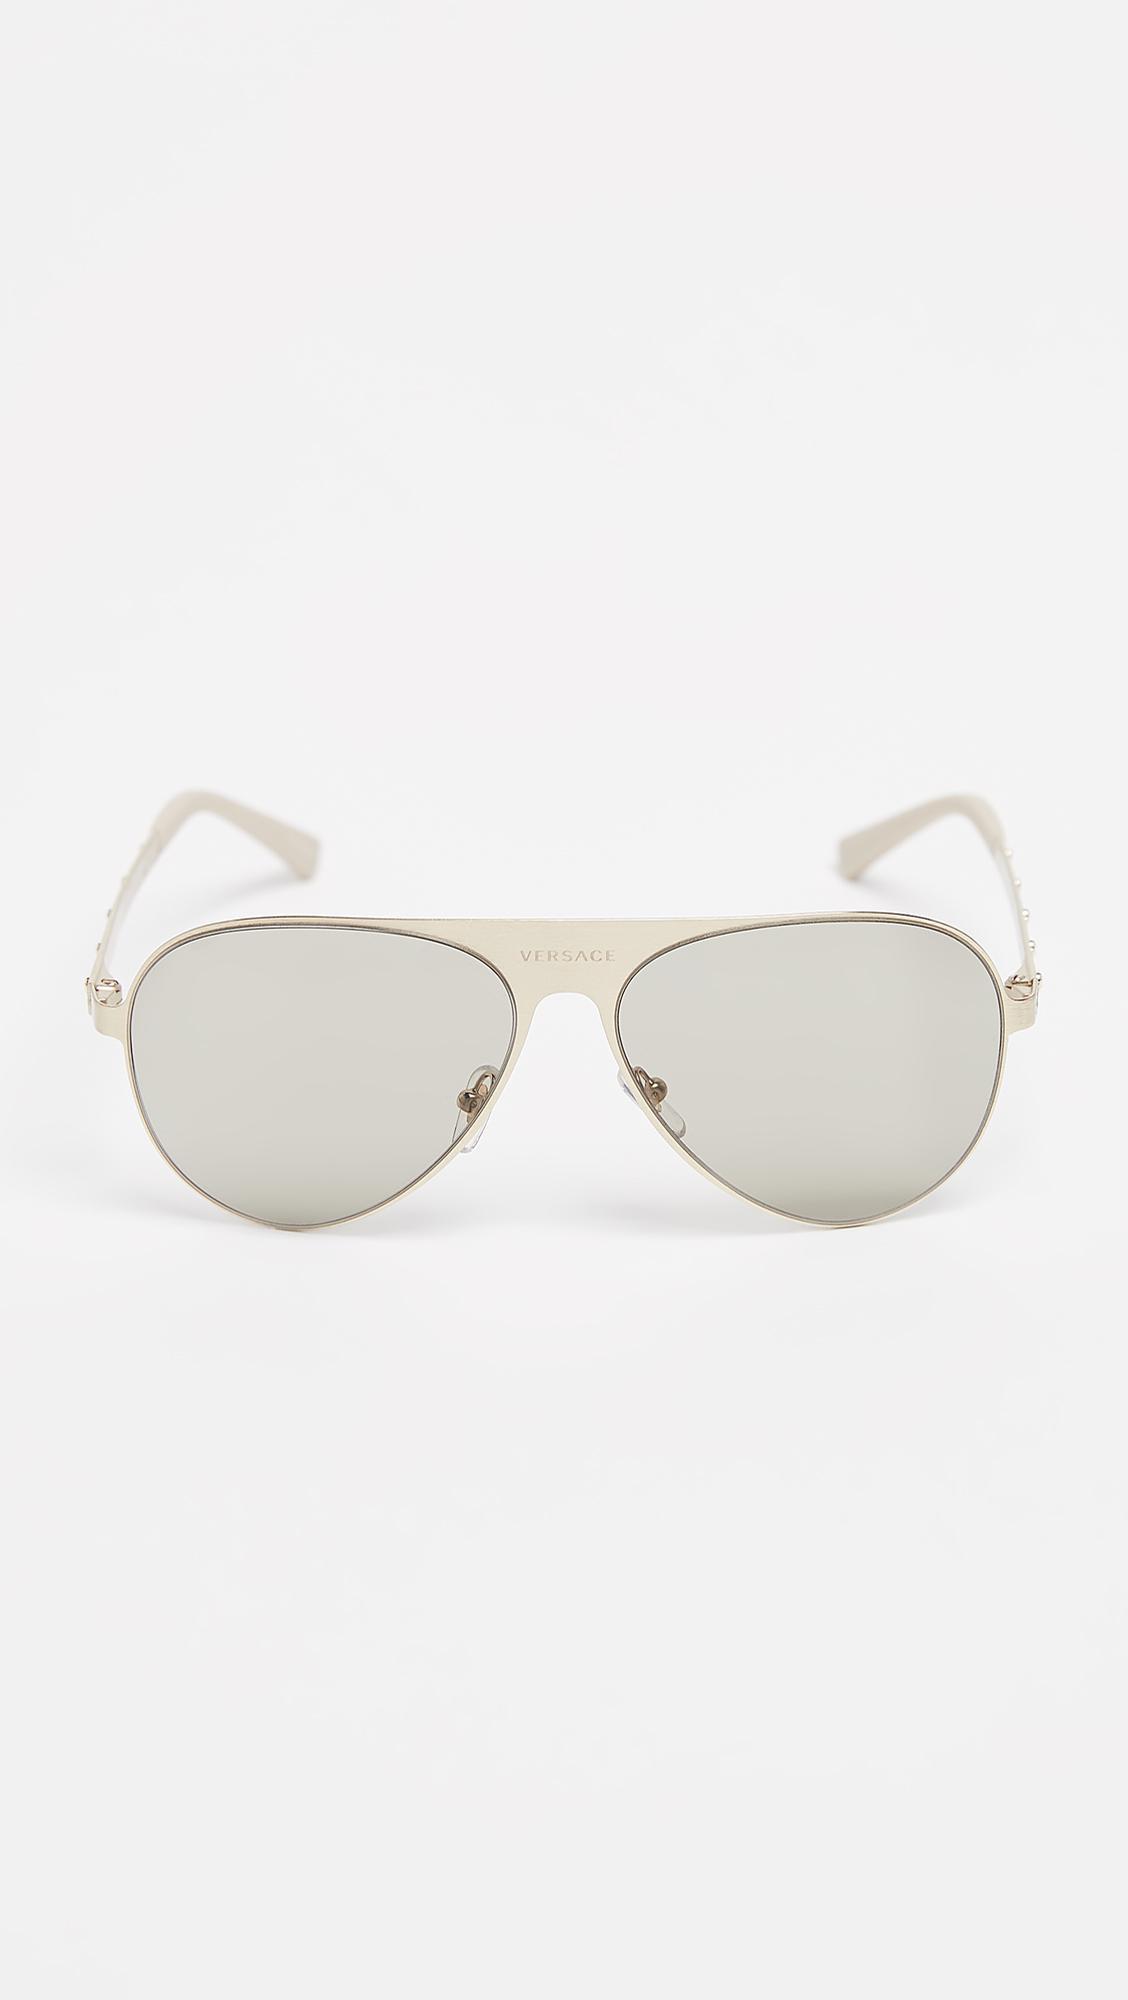 9c39e1ead8c32 Versace - Multicolor Medusina Pilot Sunglasses for Men - Lyst. View  fullscreen